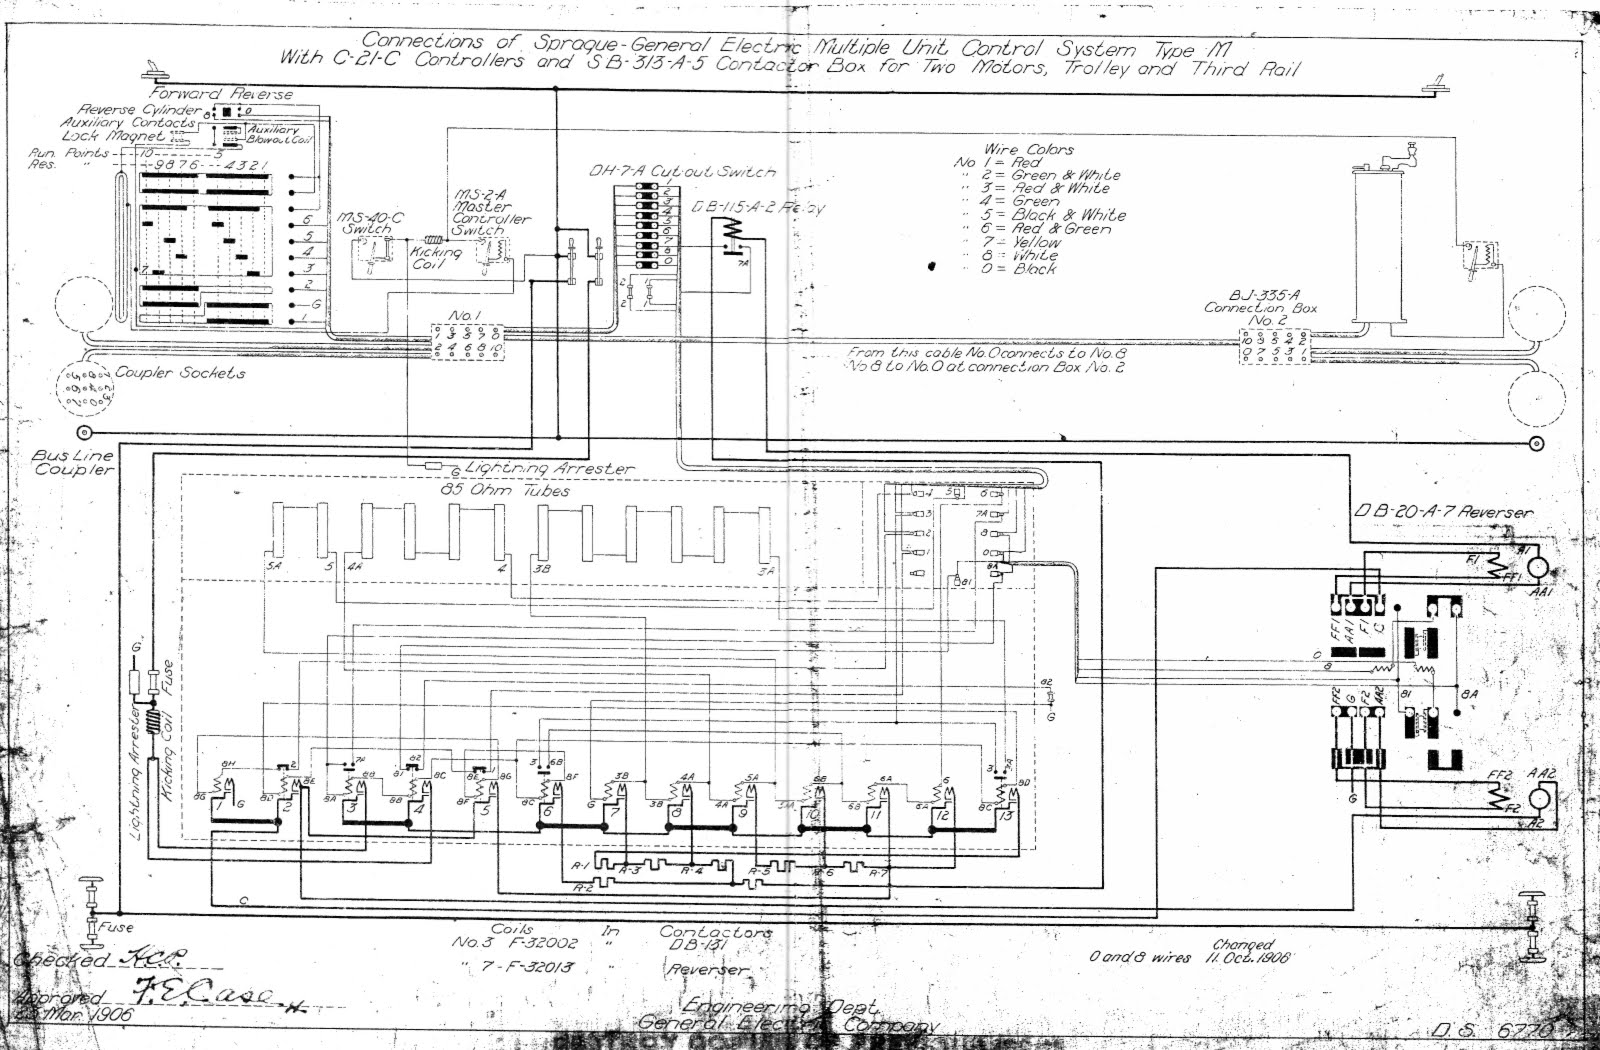 Tata+Nano+Electrical+Wiring+Diagram?t=1494835592 hd wallpapers tata indica wiring diagram manual kzs ikik info delorean wiring diagram at crackthecode.co